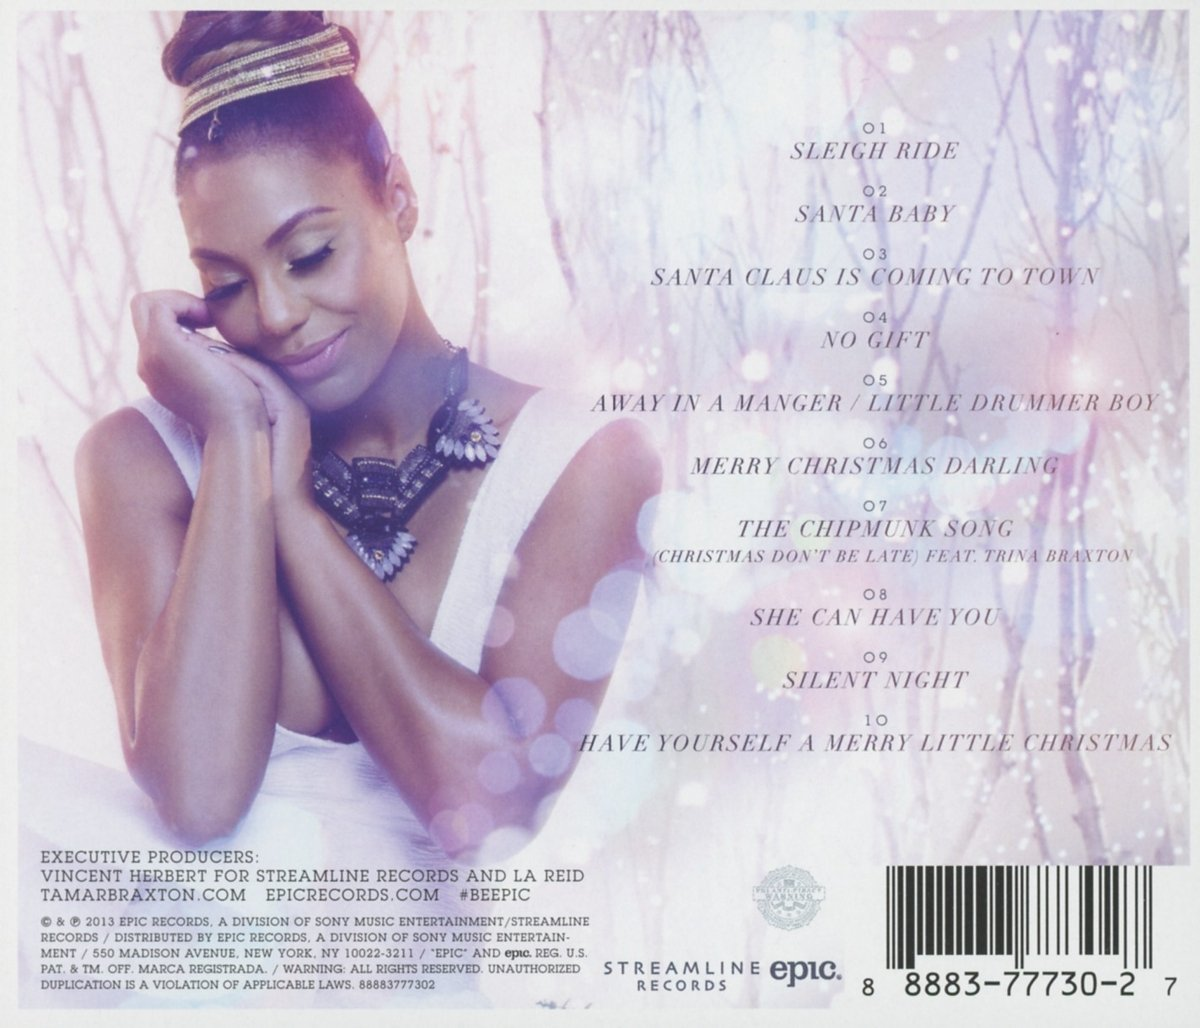 Tamar Braxton - Winter Loversland - Amazon.com Music